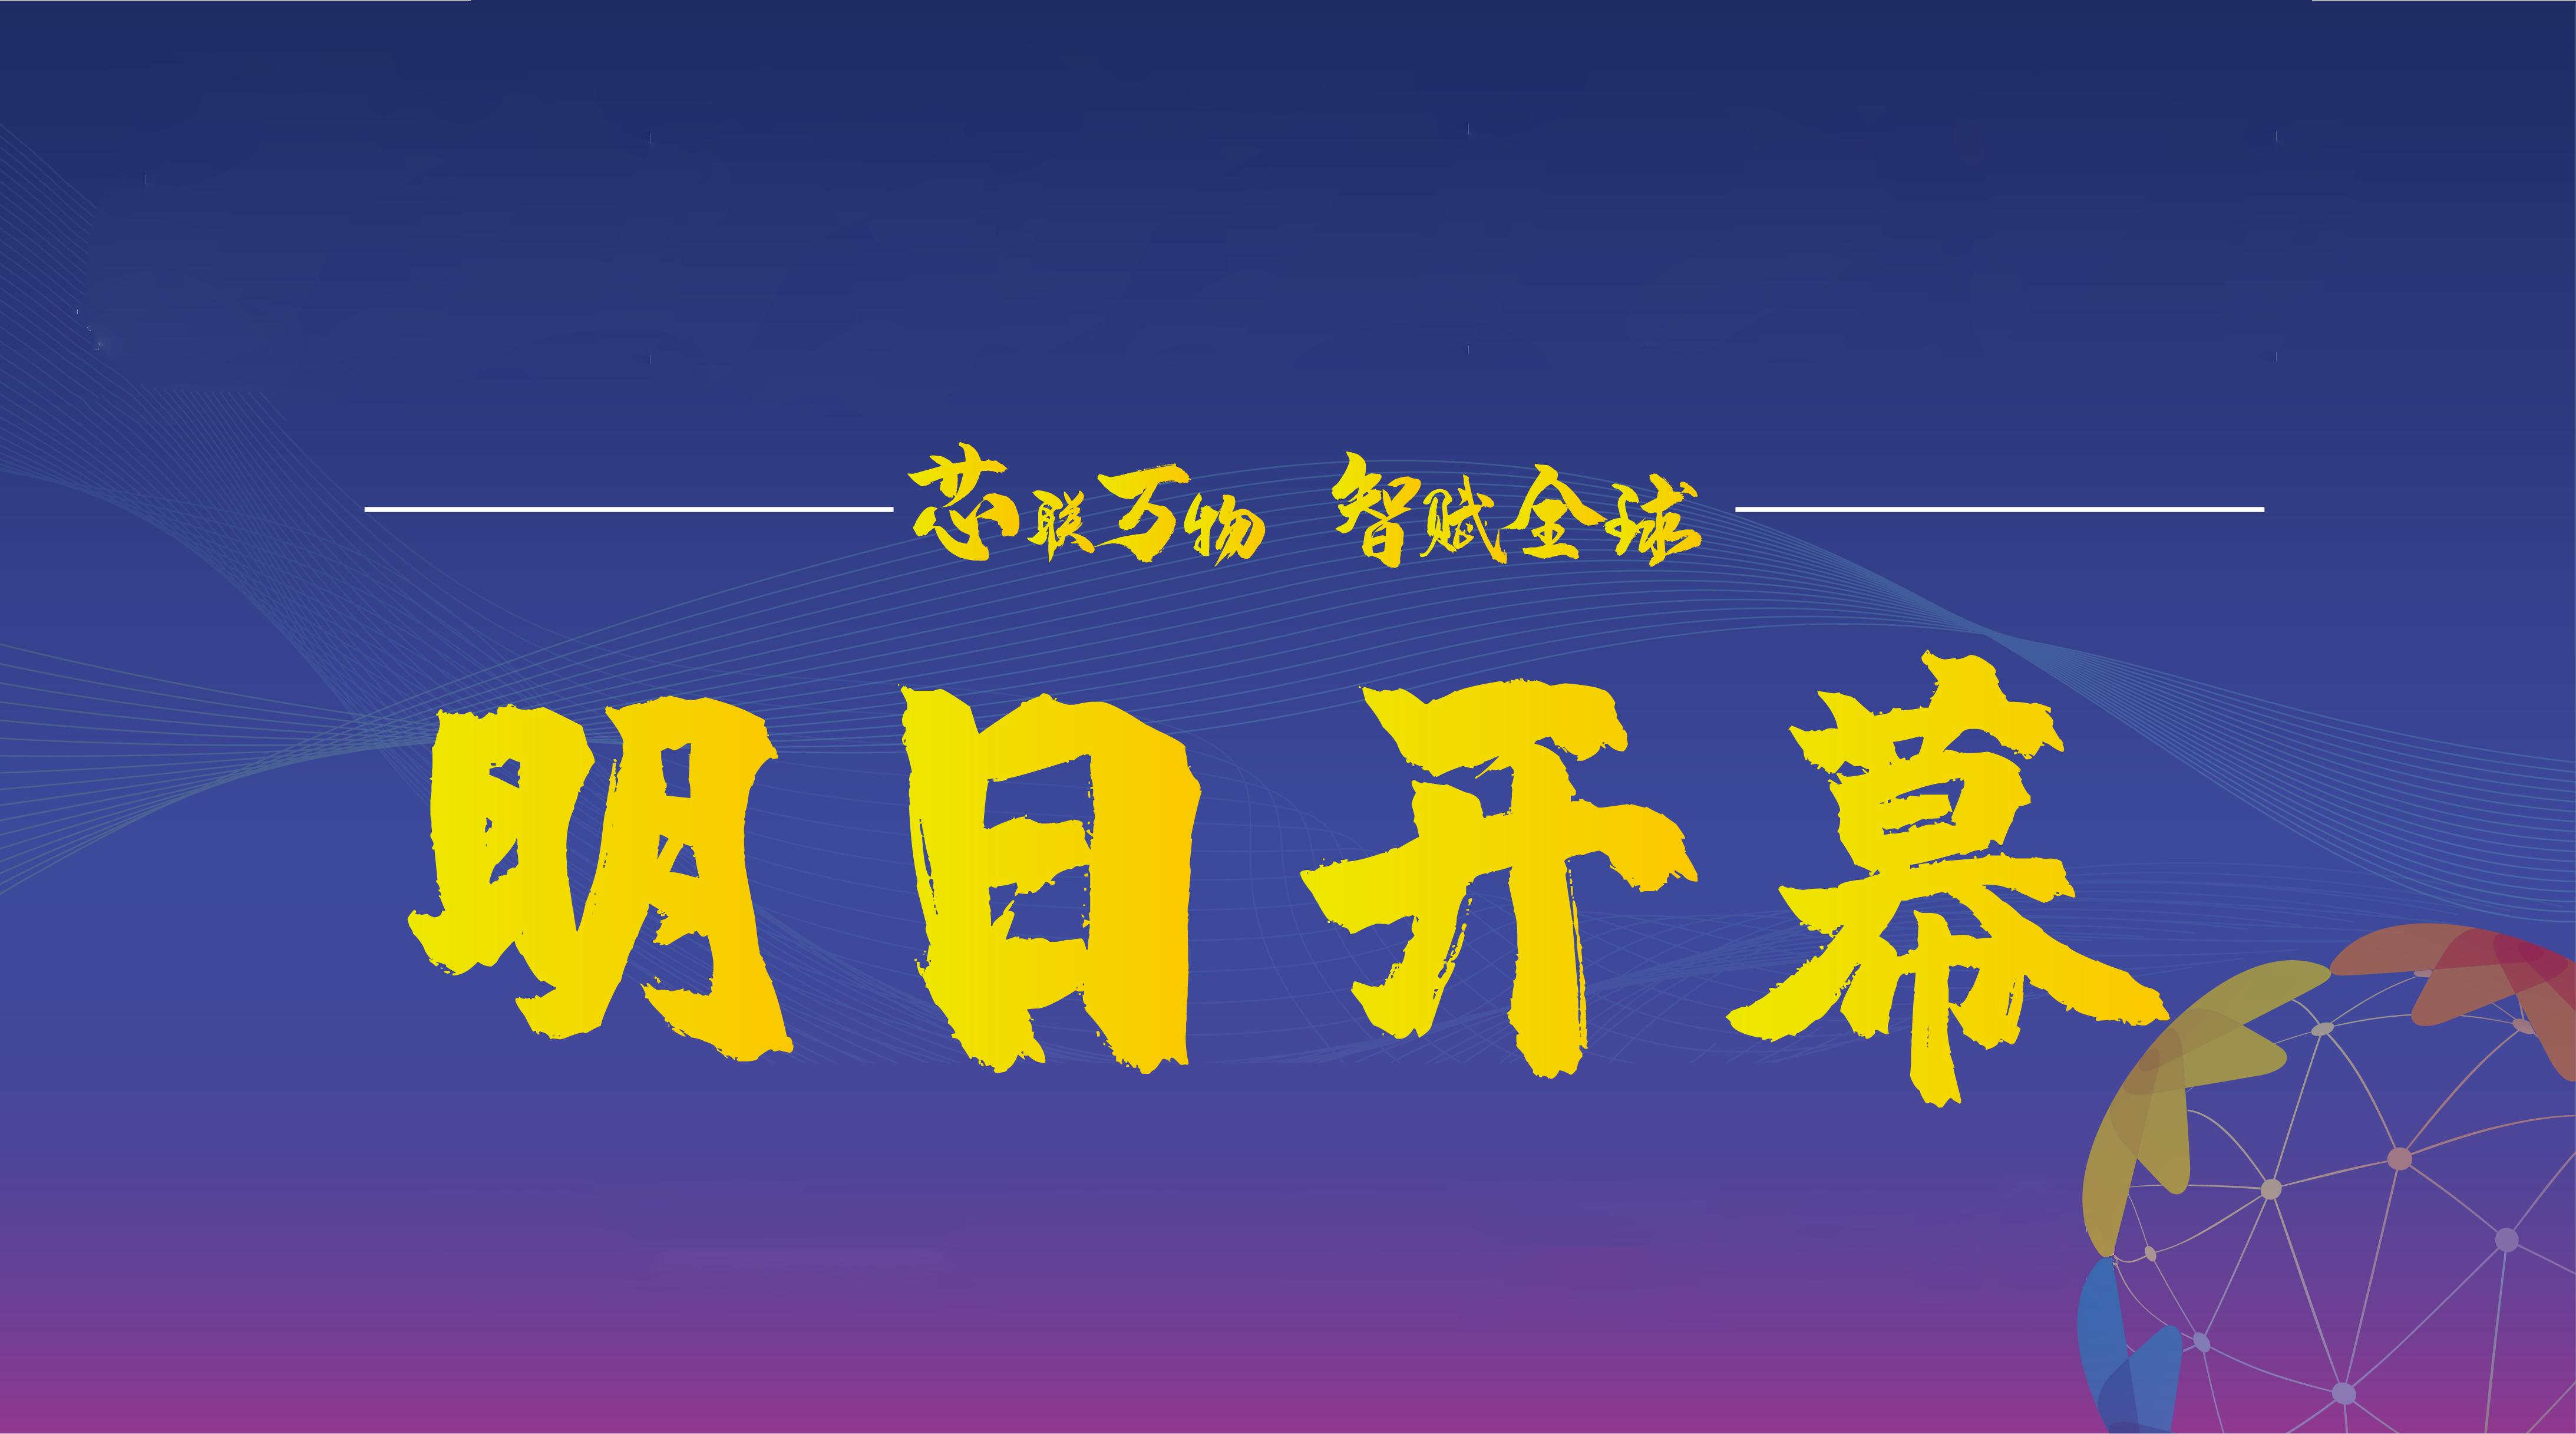 IOTE 2021国际东赢体育平台展深圳站·重要通知